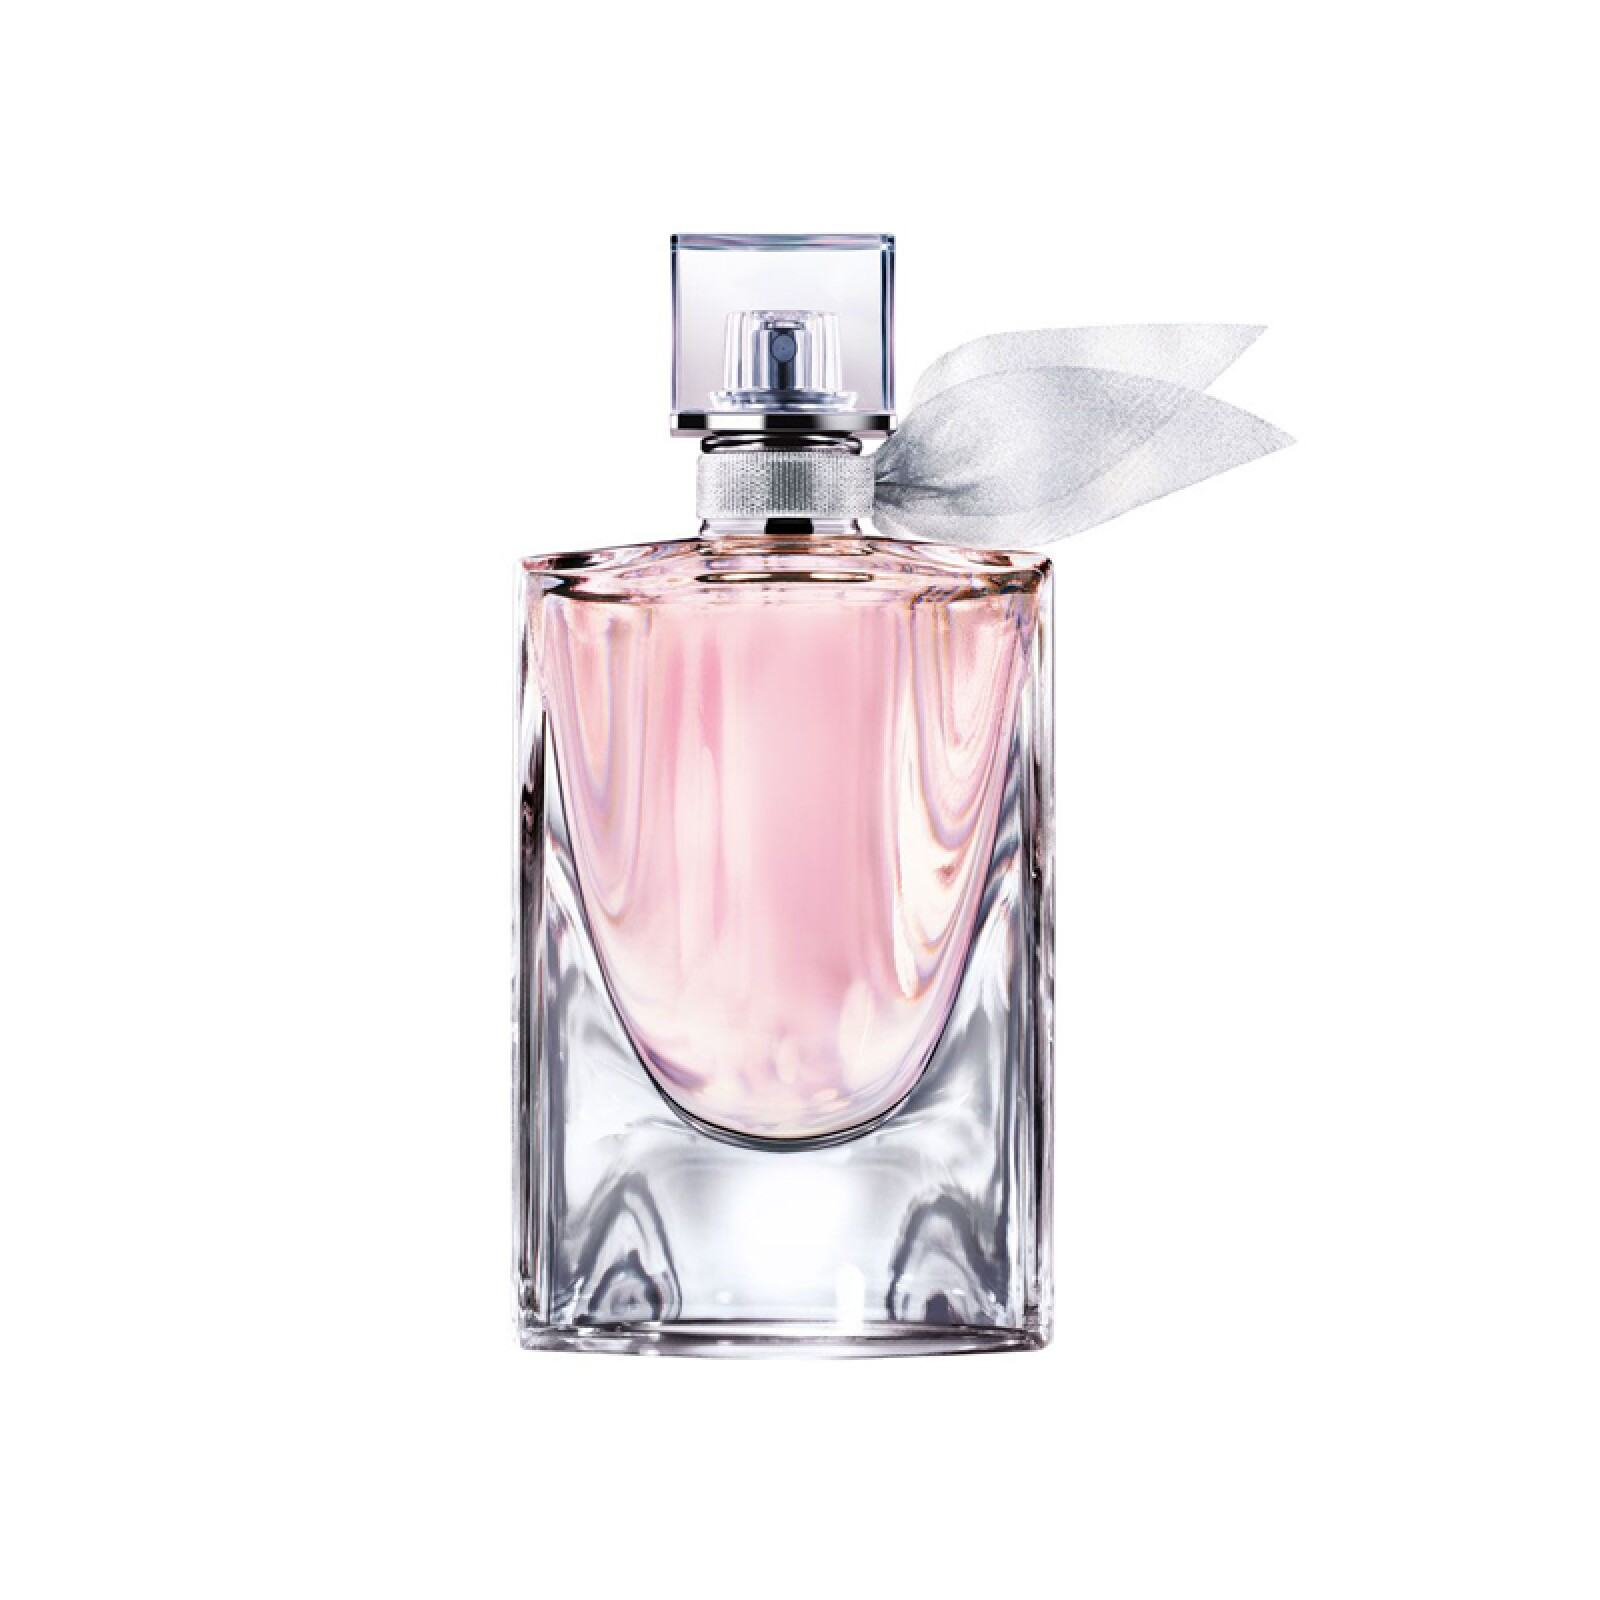 fragancias-perfumes-primavera-aroma-notas-floral-lancome